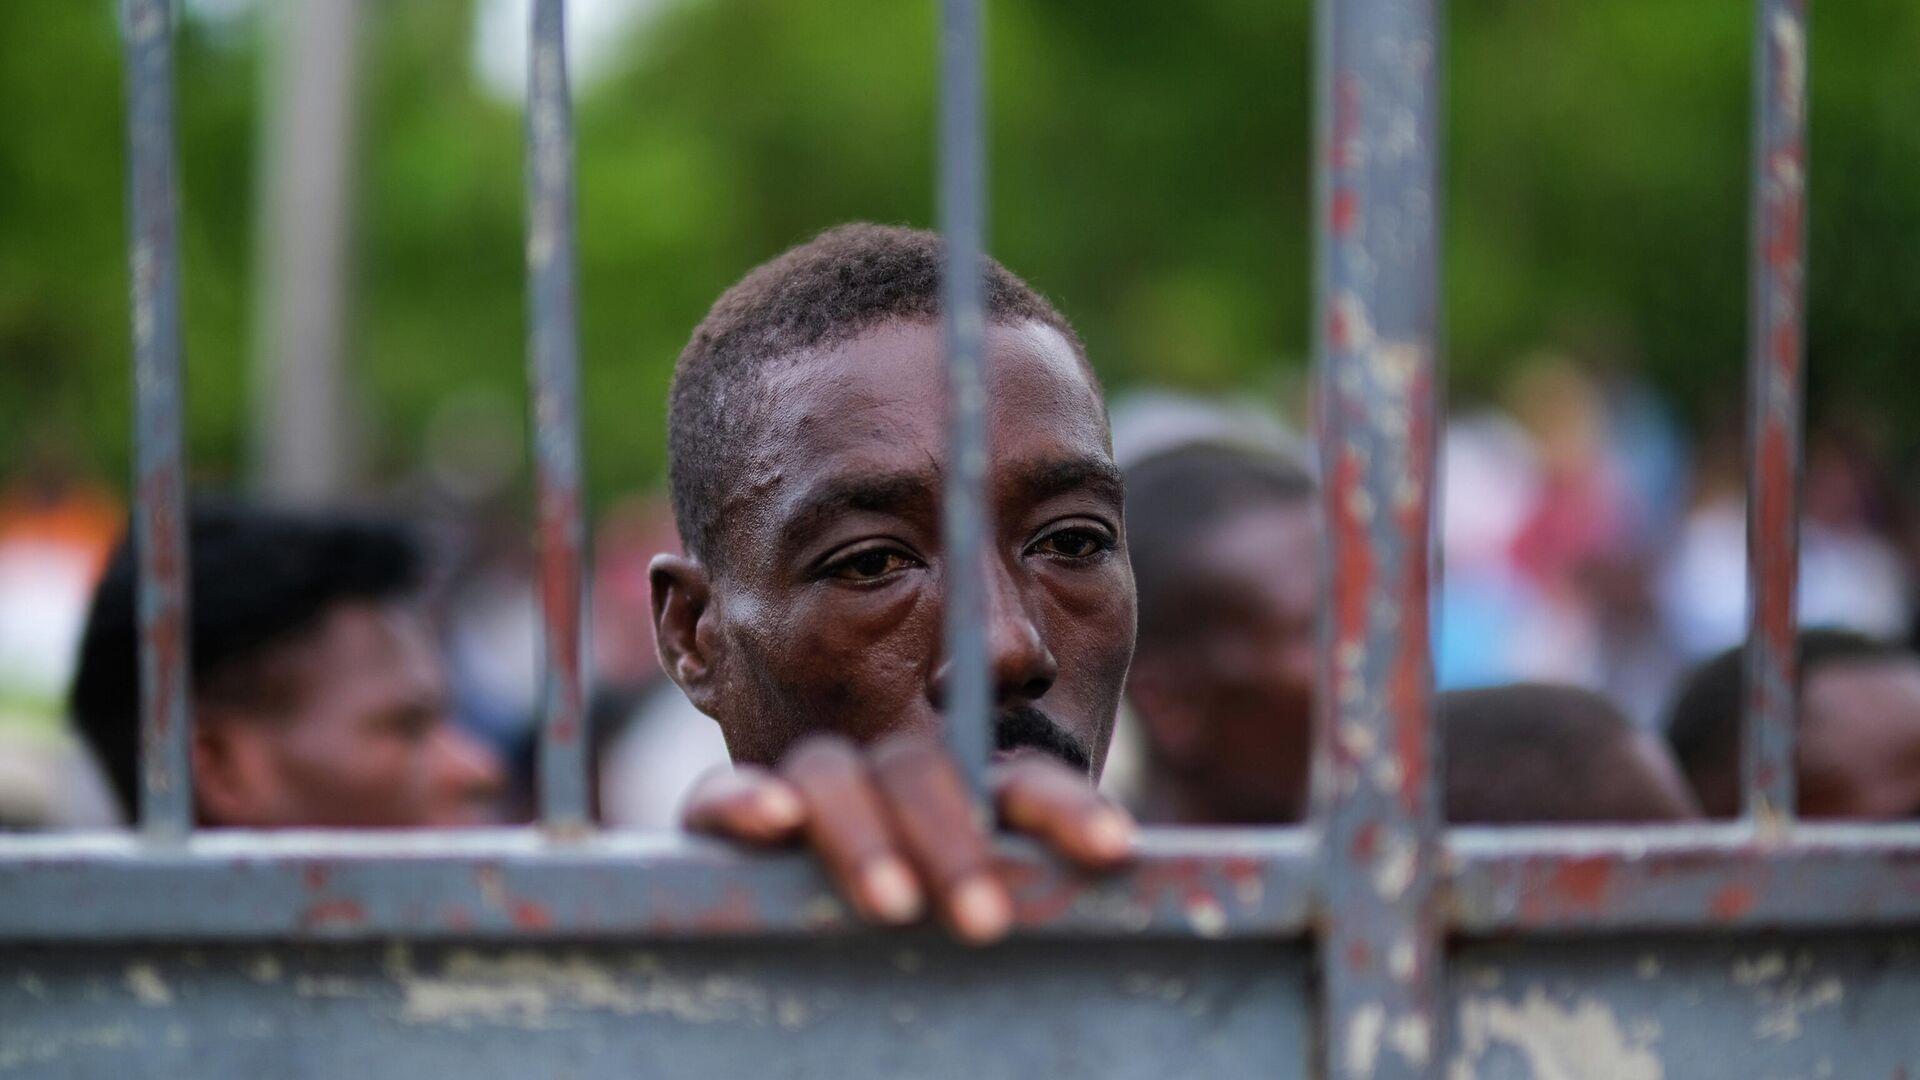 Crisis humanitaria en Haití - Sputnik Mundo, 1920, 31.08.2021